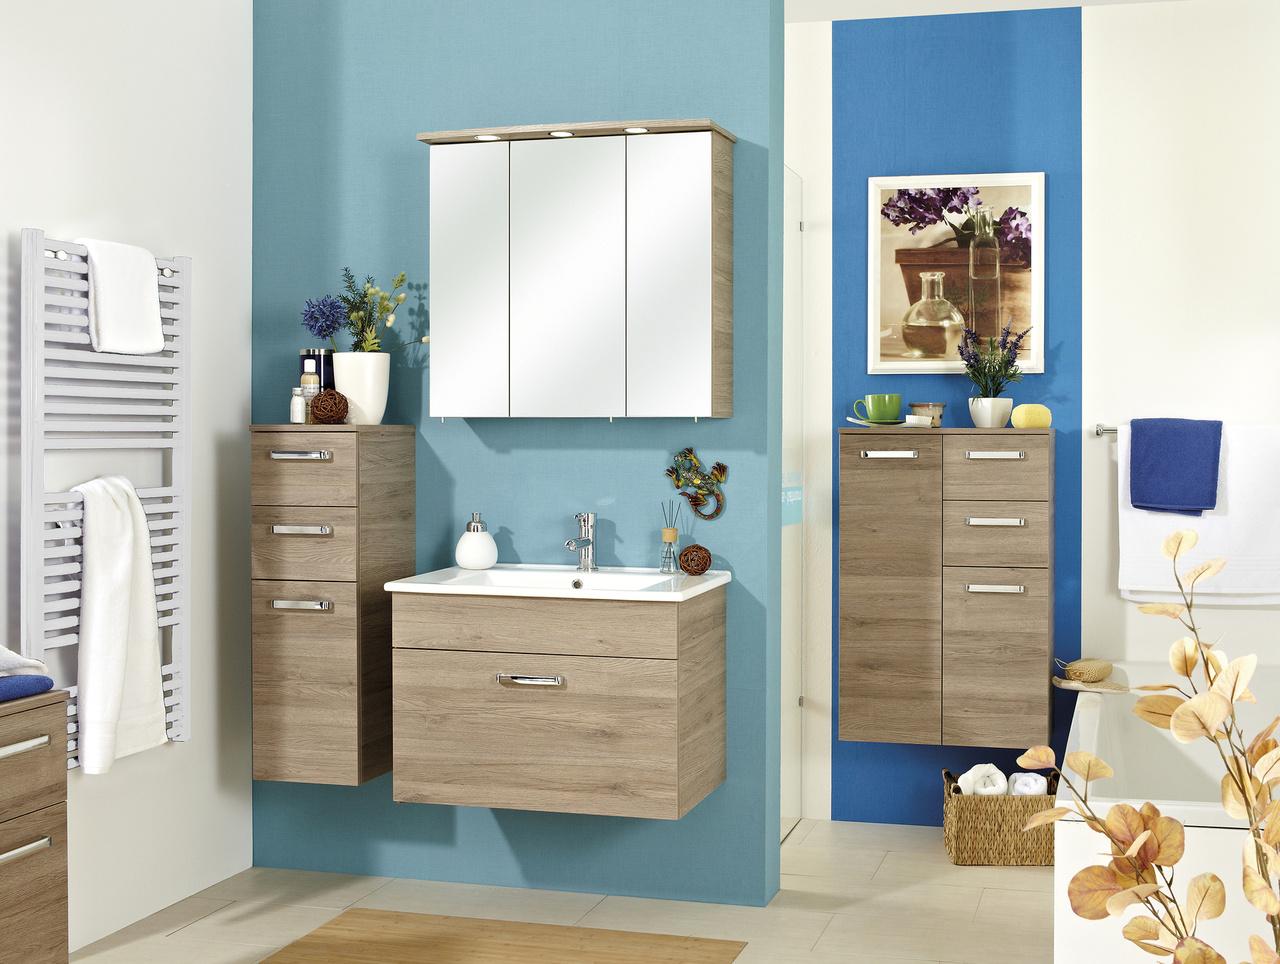 313 OFFENBACH - QuickSet - Bathroom furniture - Brands furniture by ...